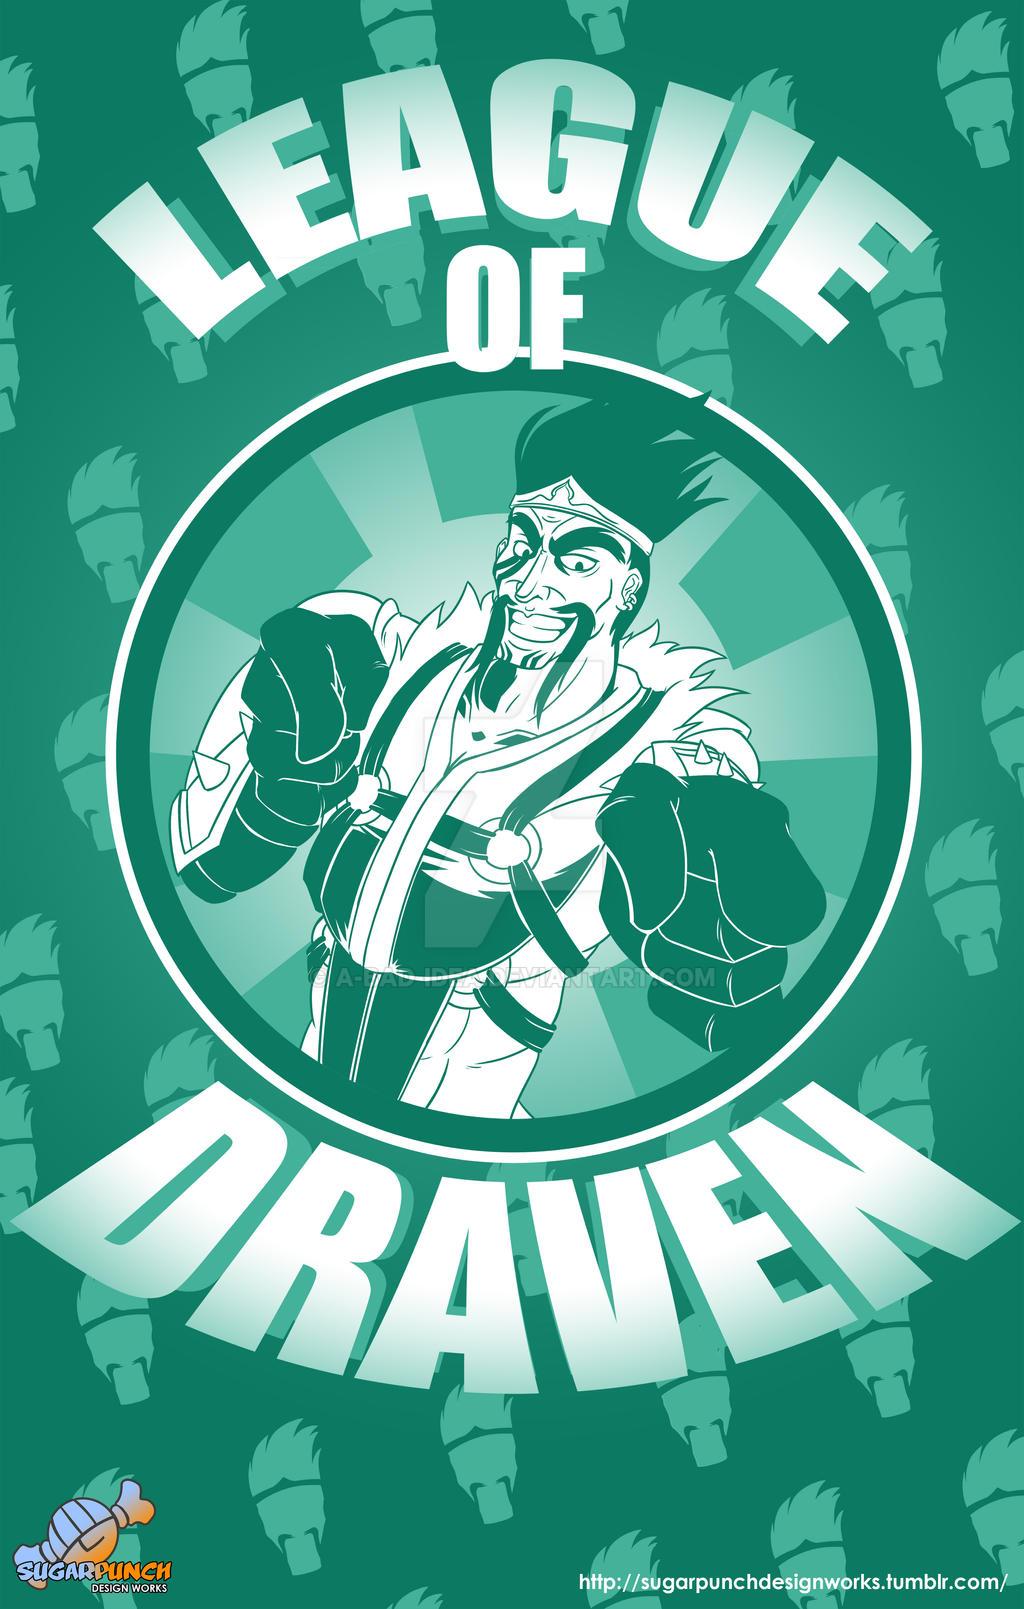 League of Draven by a-bad-idea